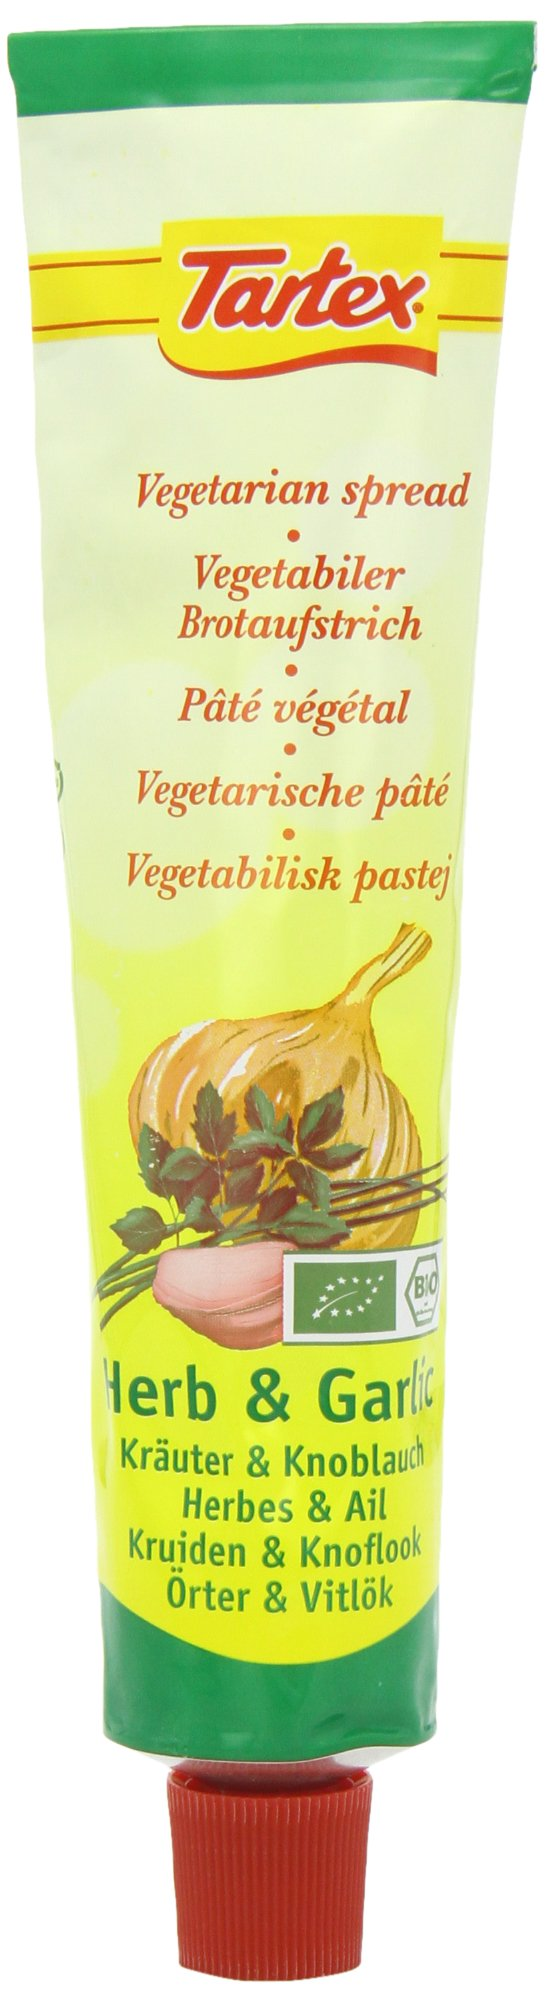 Tartex Organic Herbal and Garlic Pate Tube 200 g (Pack of 4)